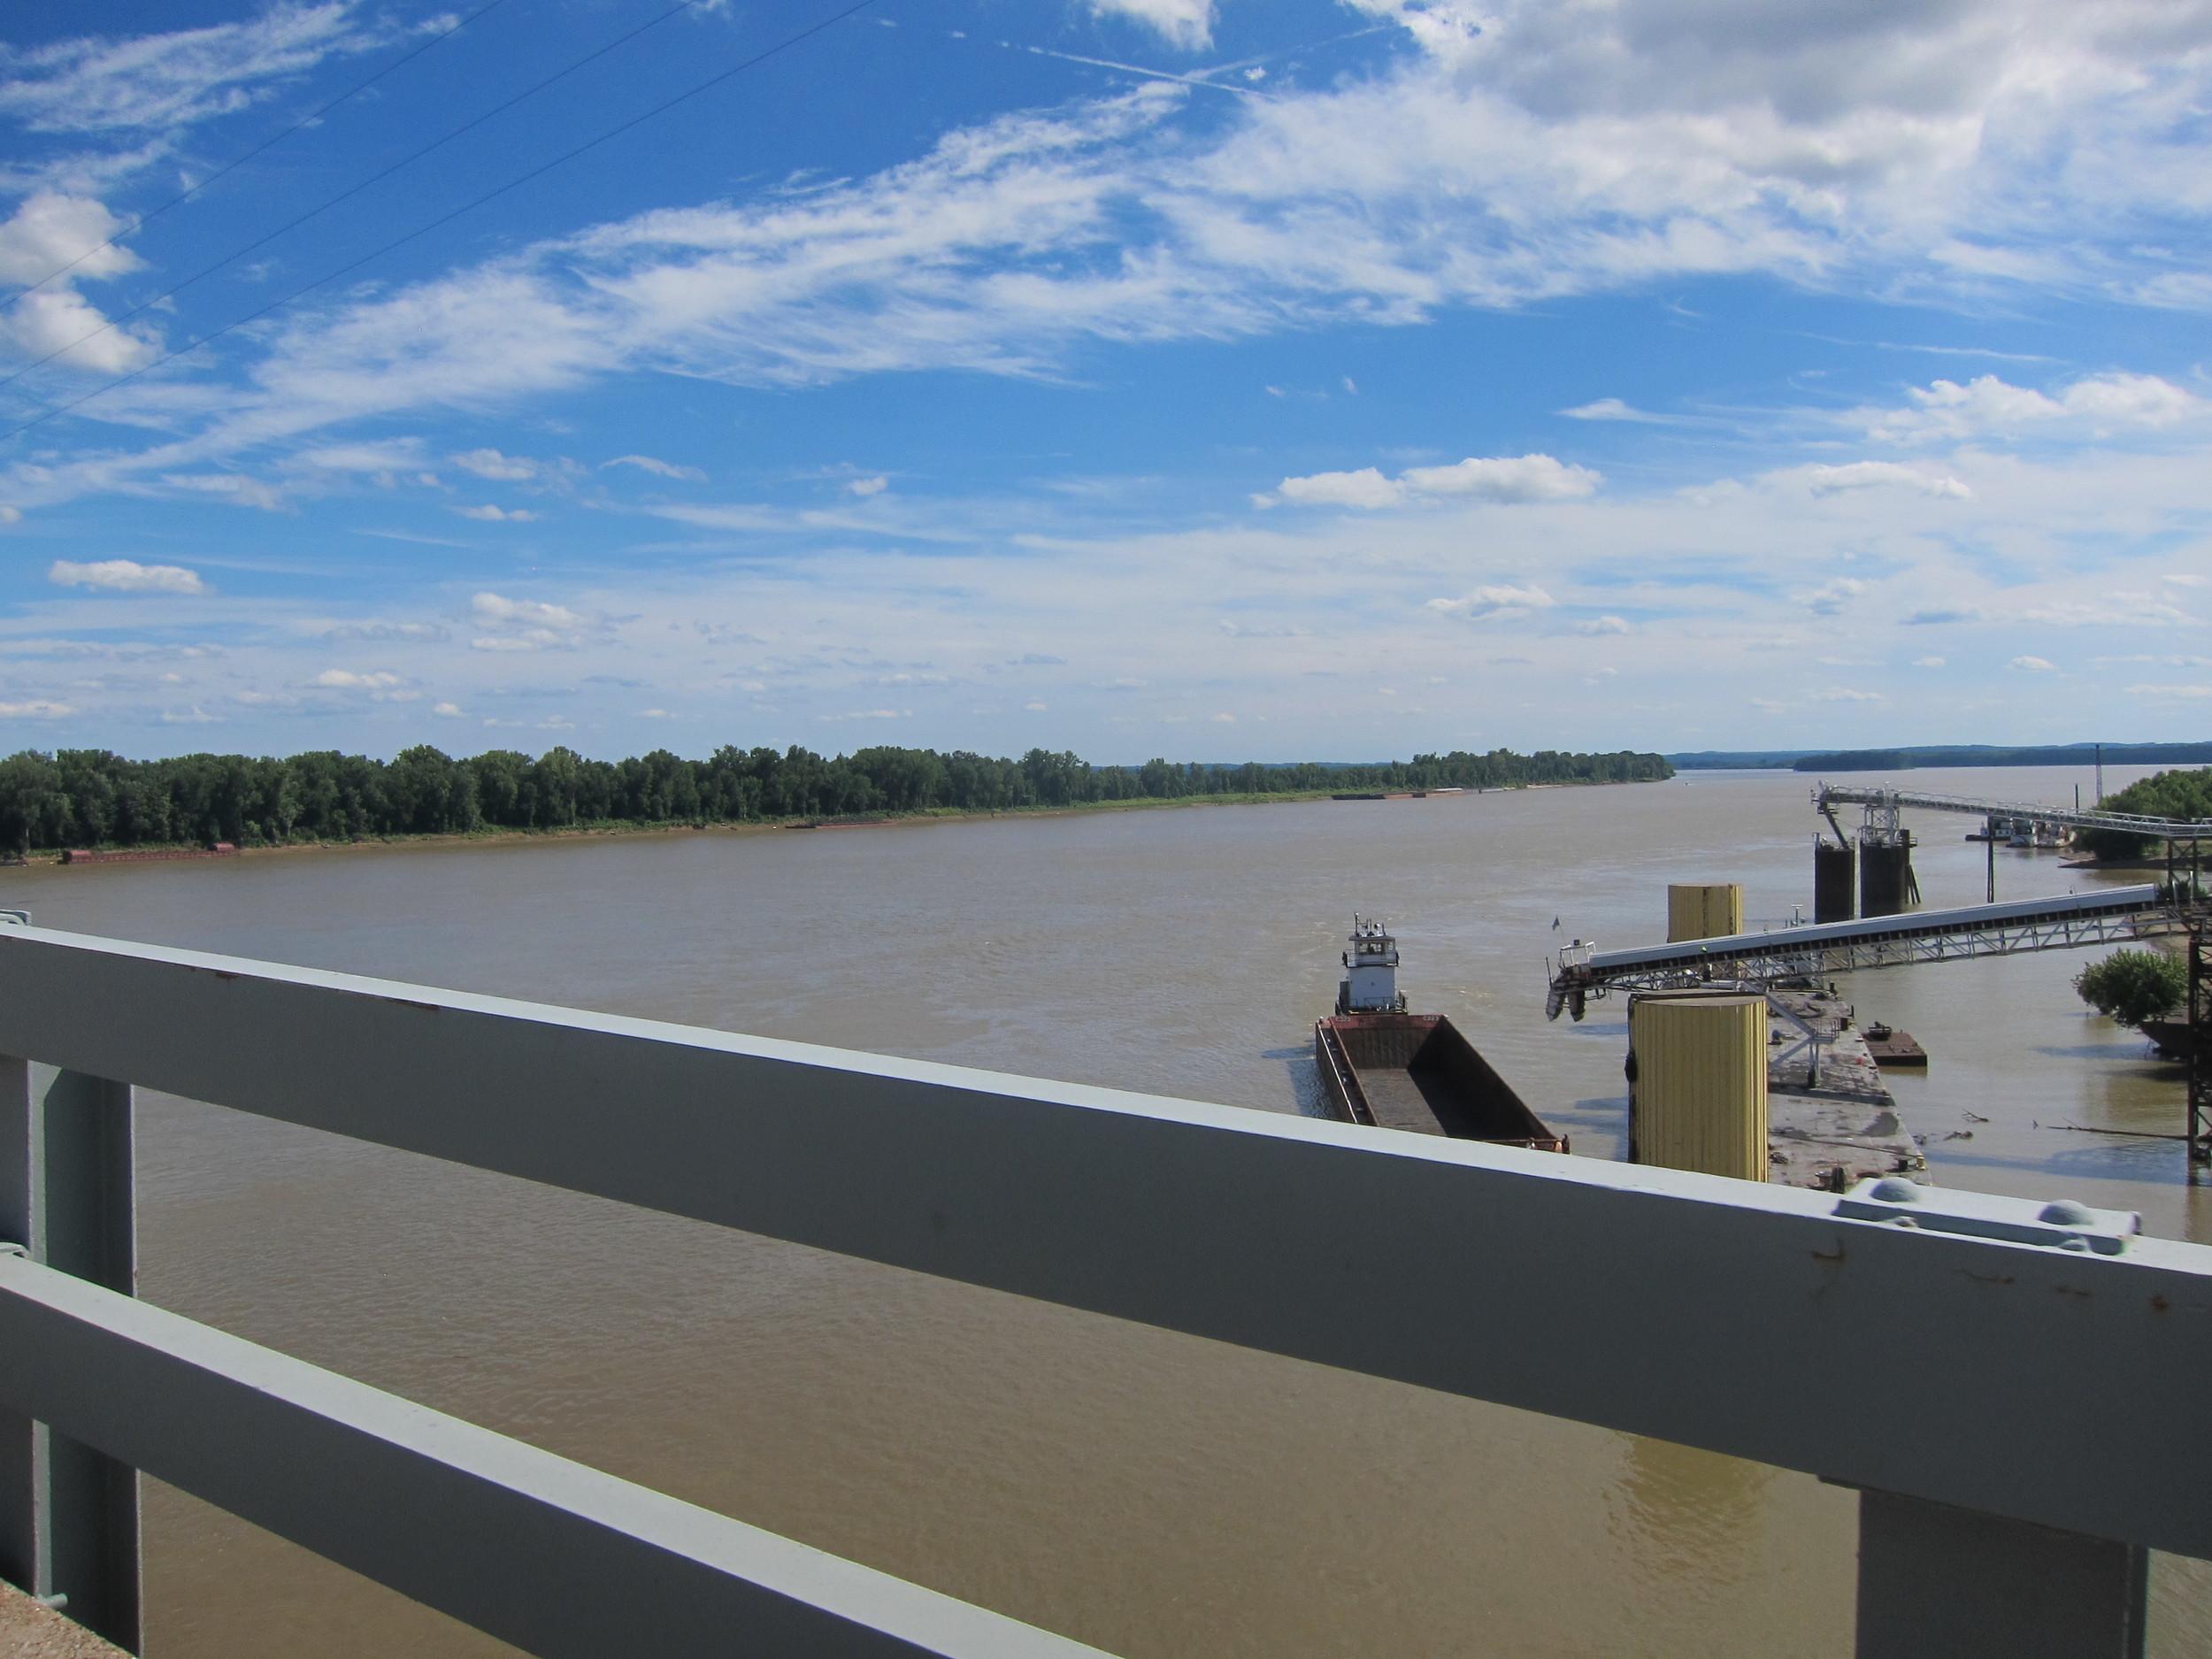 Crossing the Ohio River (Illinois/Kentucky border)